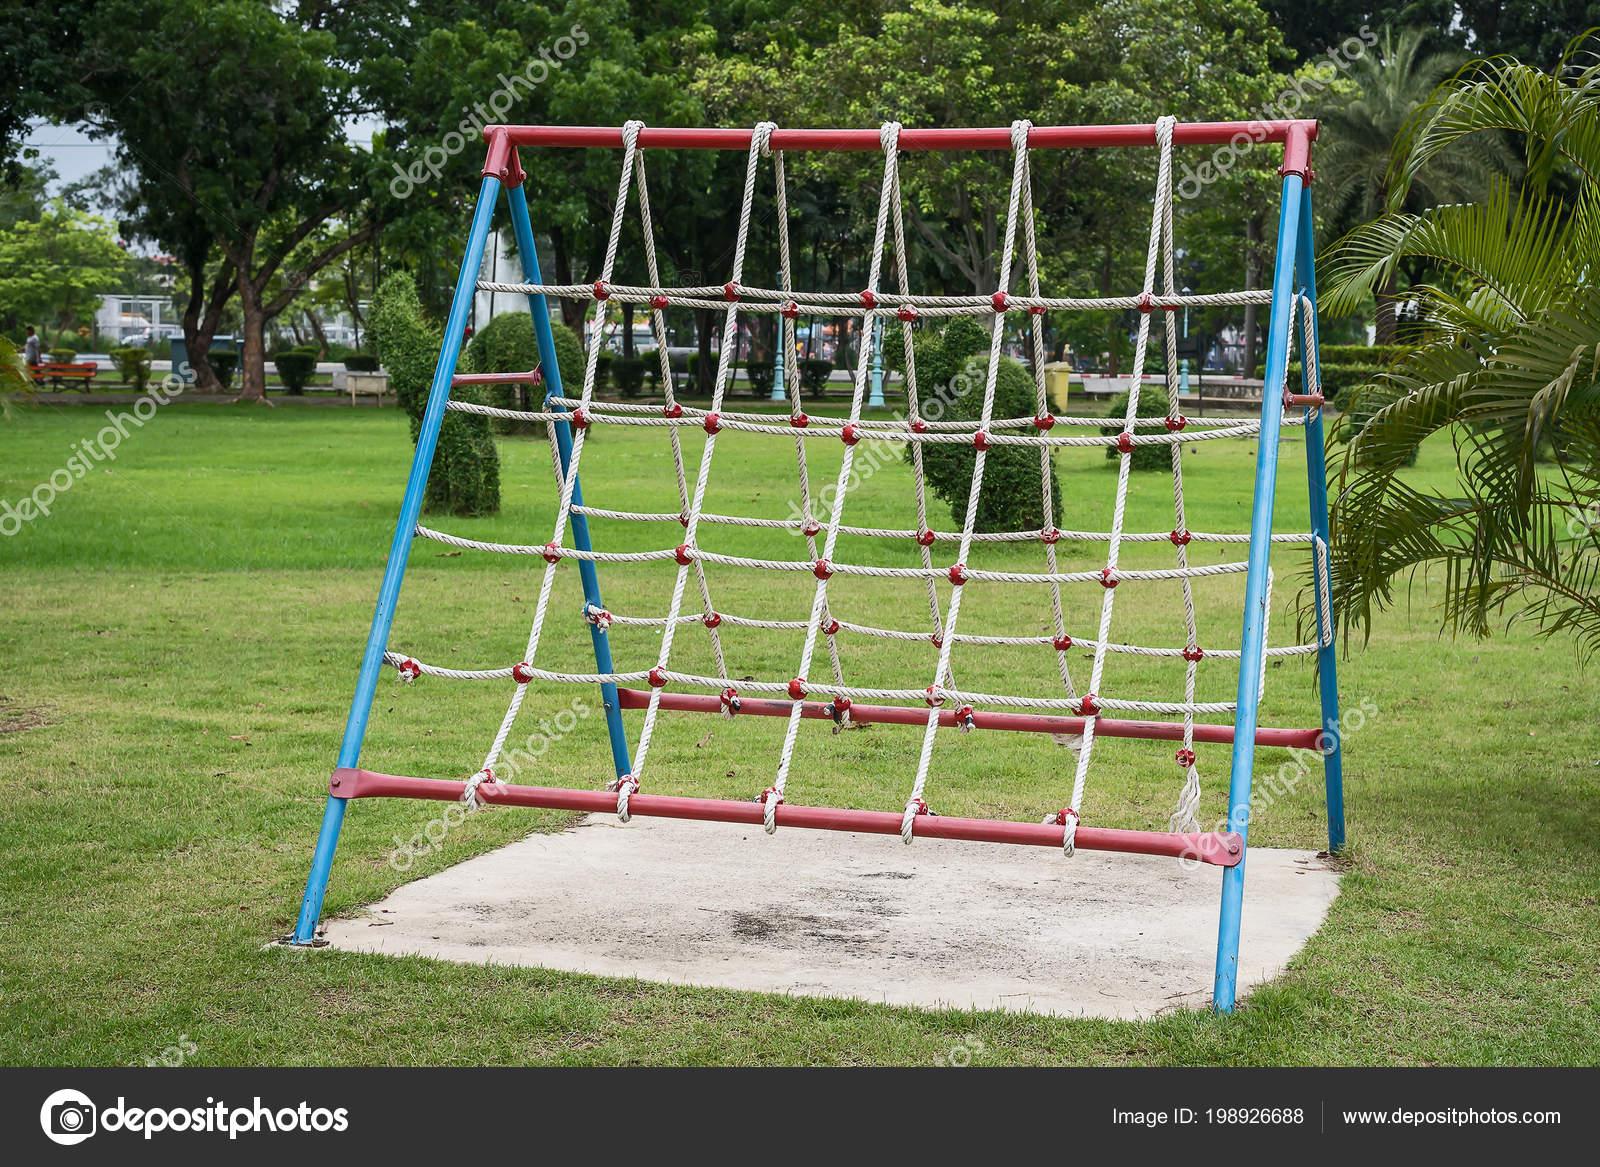 Klettergerüst English : Klettergerüst für kinder klettern u stockfoto appstock